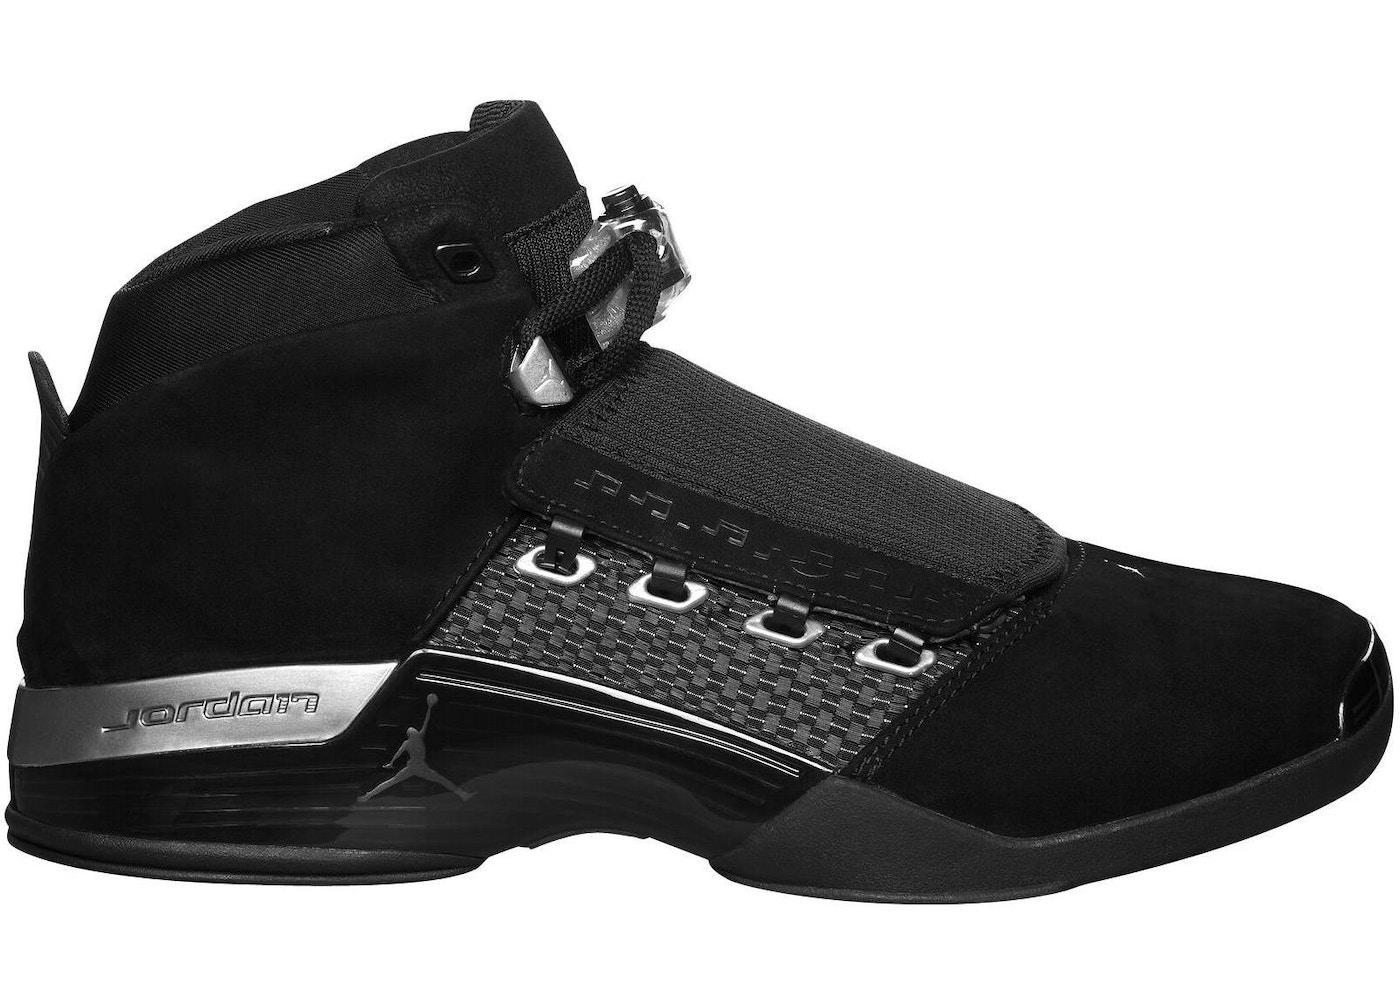 ca59b5aaf37d Buy Air Jordan 17 Shoes   Deadstock Sneakers